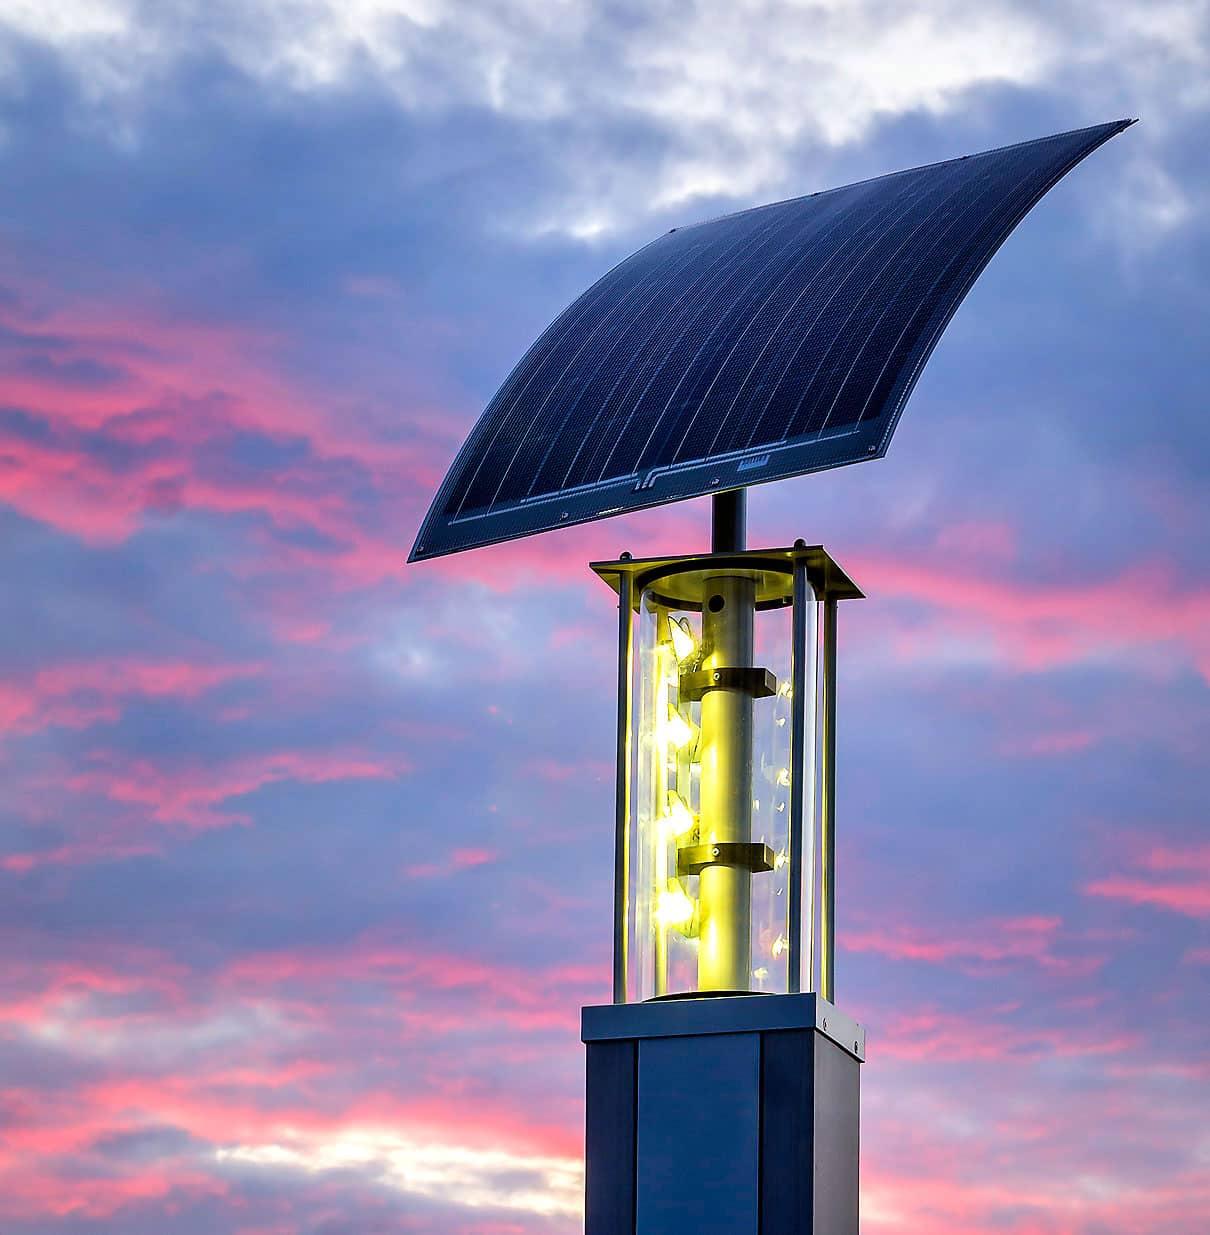 Flexible solar panels for ecoLights solar street pole | Metsolar